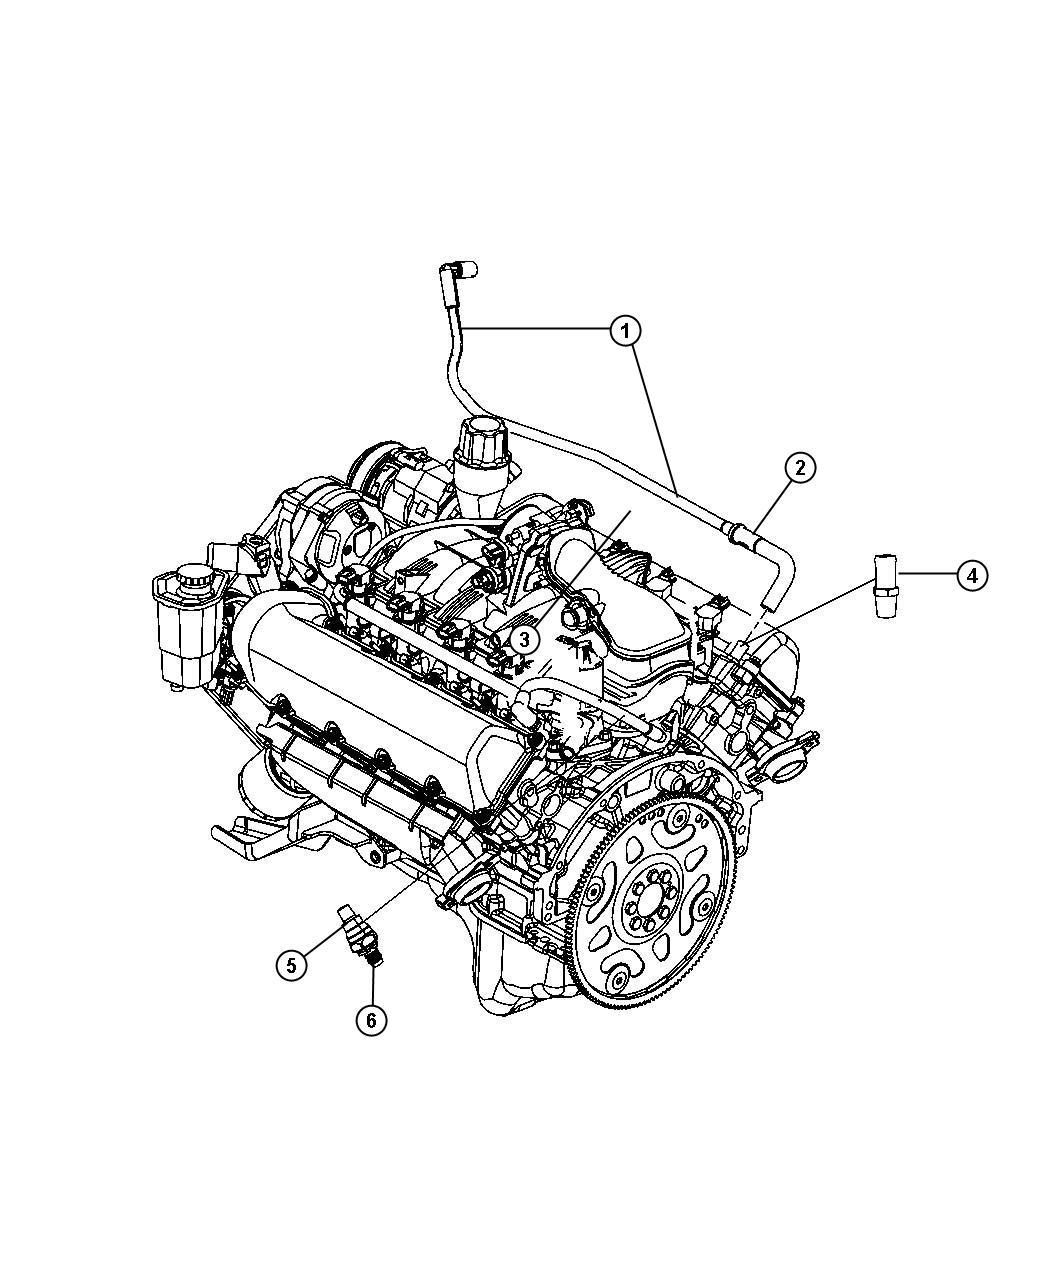 Chrysler Crankcase Ventilation 4 7l 4 7l V8 Mpi Engine